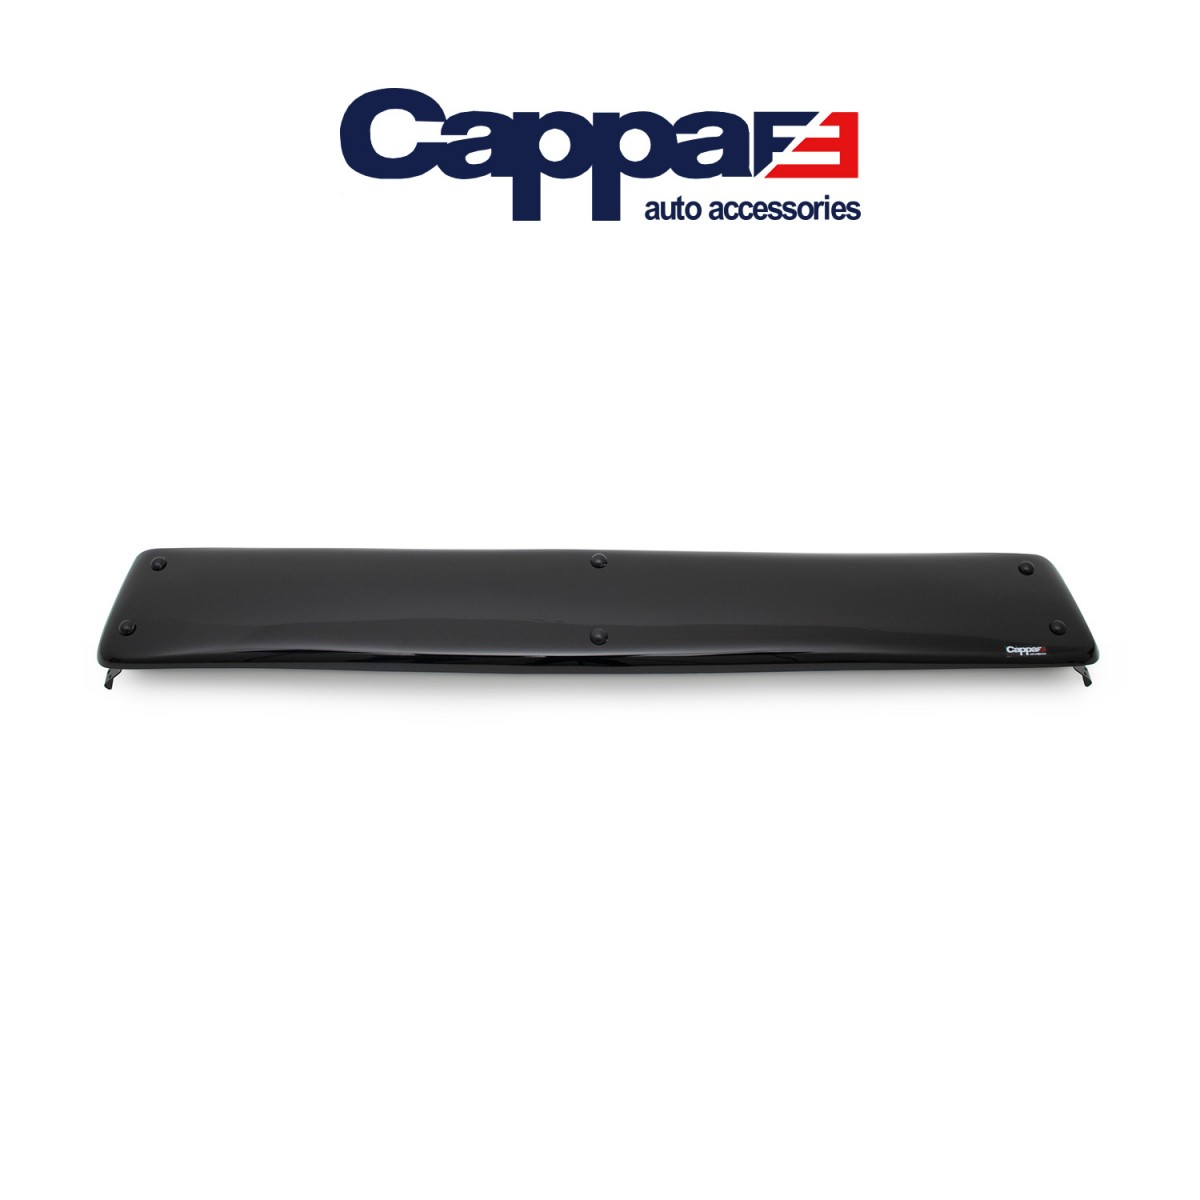 CAPPAFE Isuzu NKR Low Ön Cam Güneşliği Vizör Şapka Terek Parlak Siyah 2006 - 2009